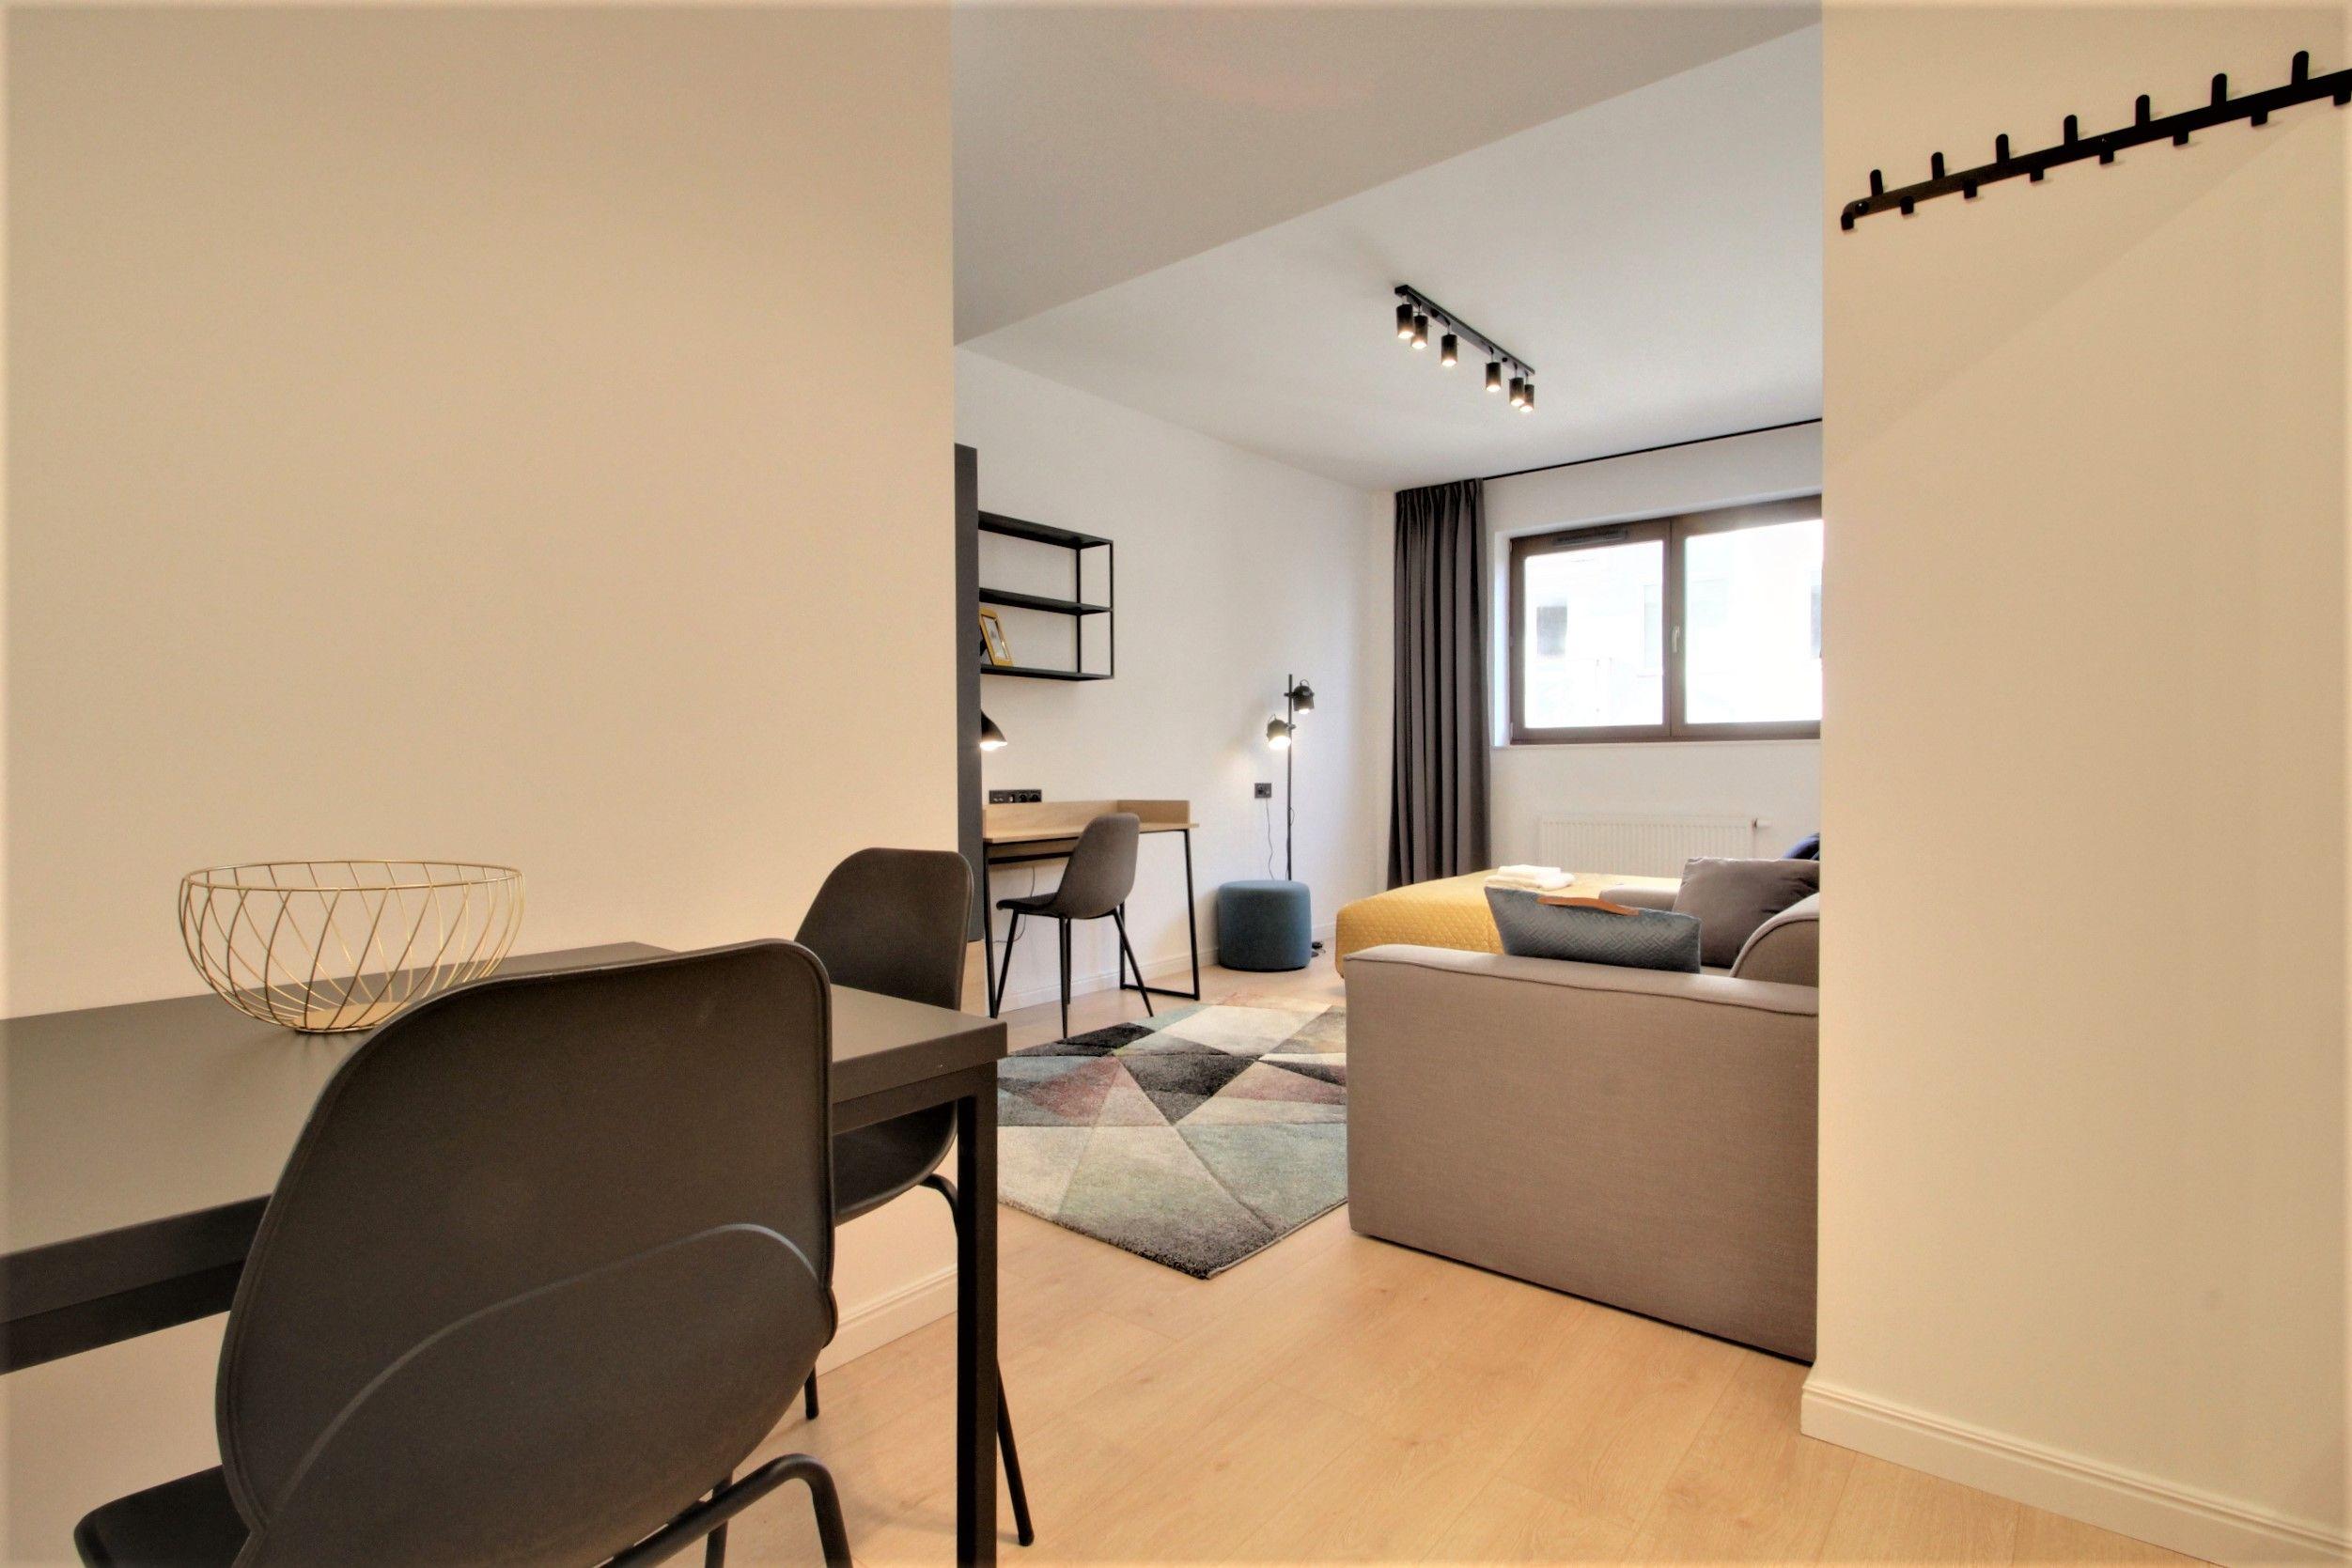 Studio - Small